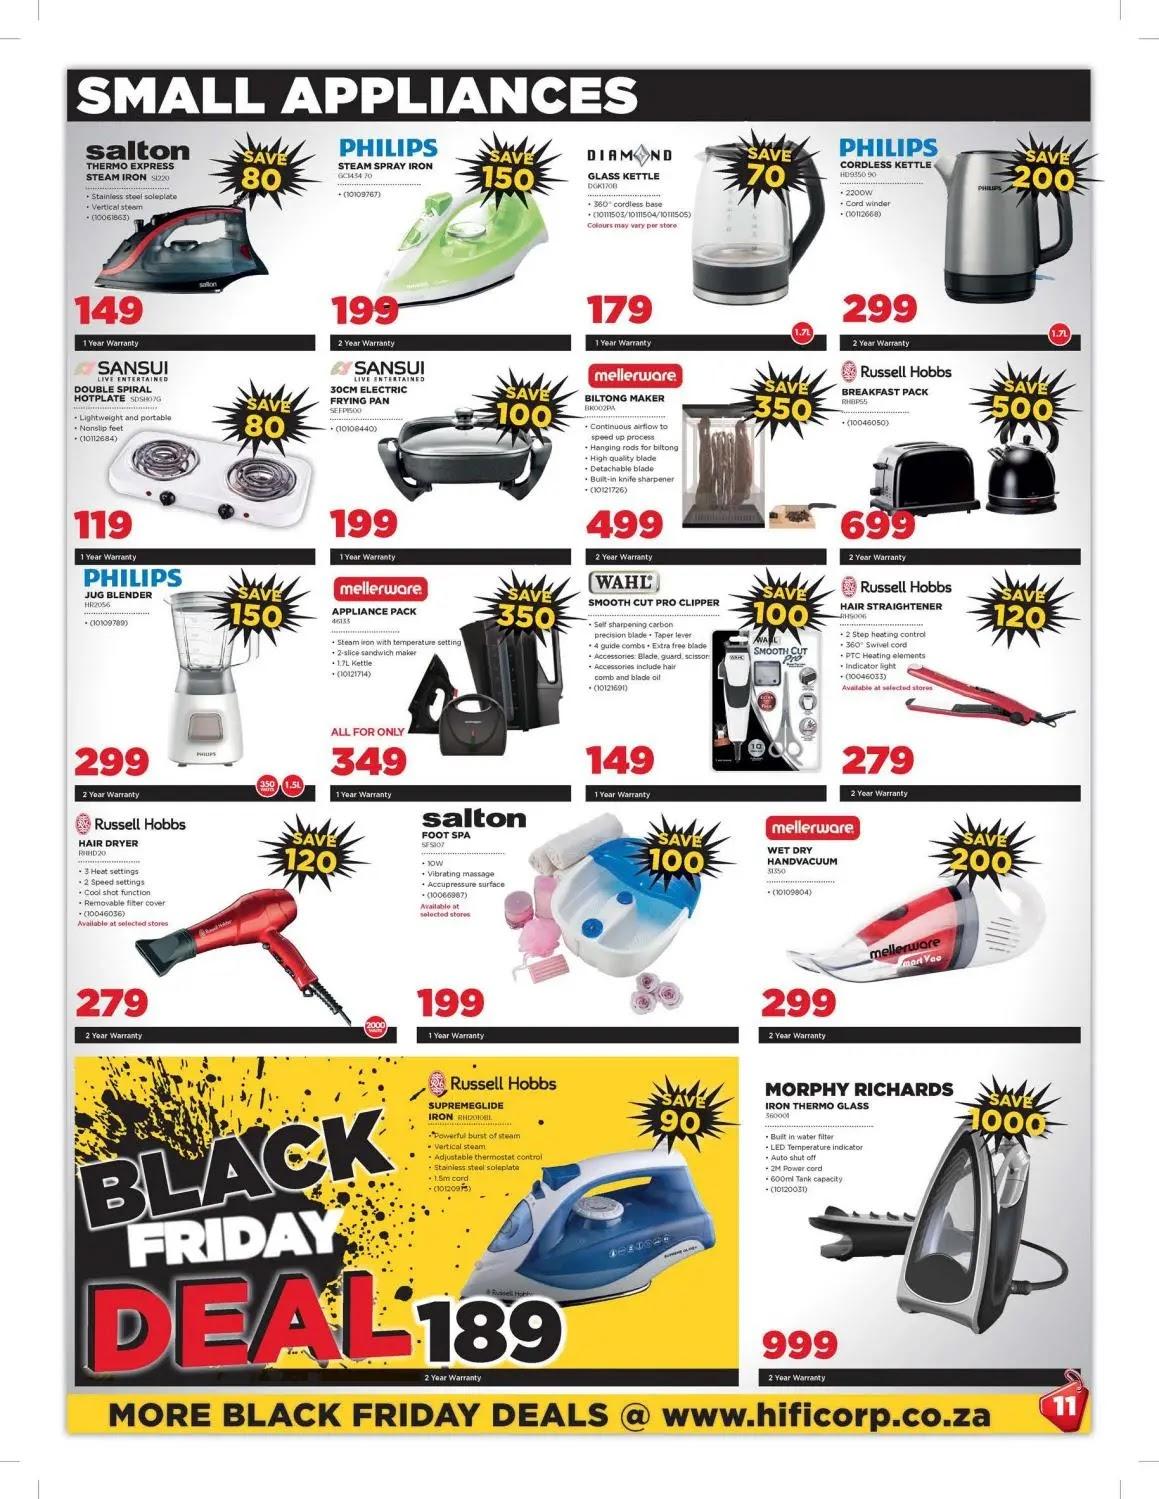 HiFi Corporation Black Friday Deals  Page 11